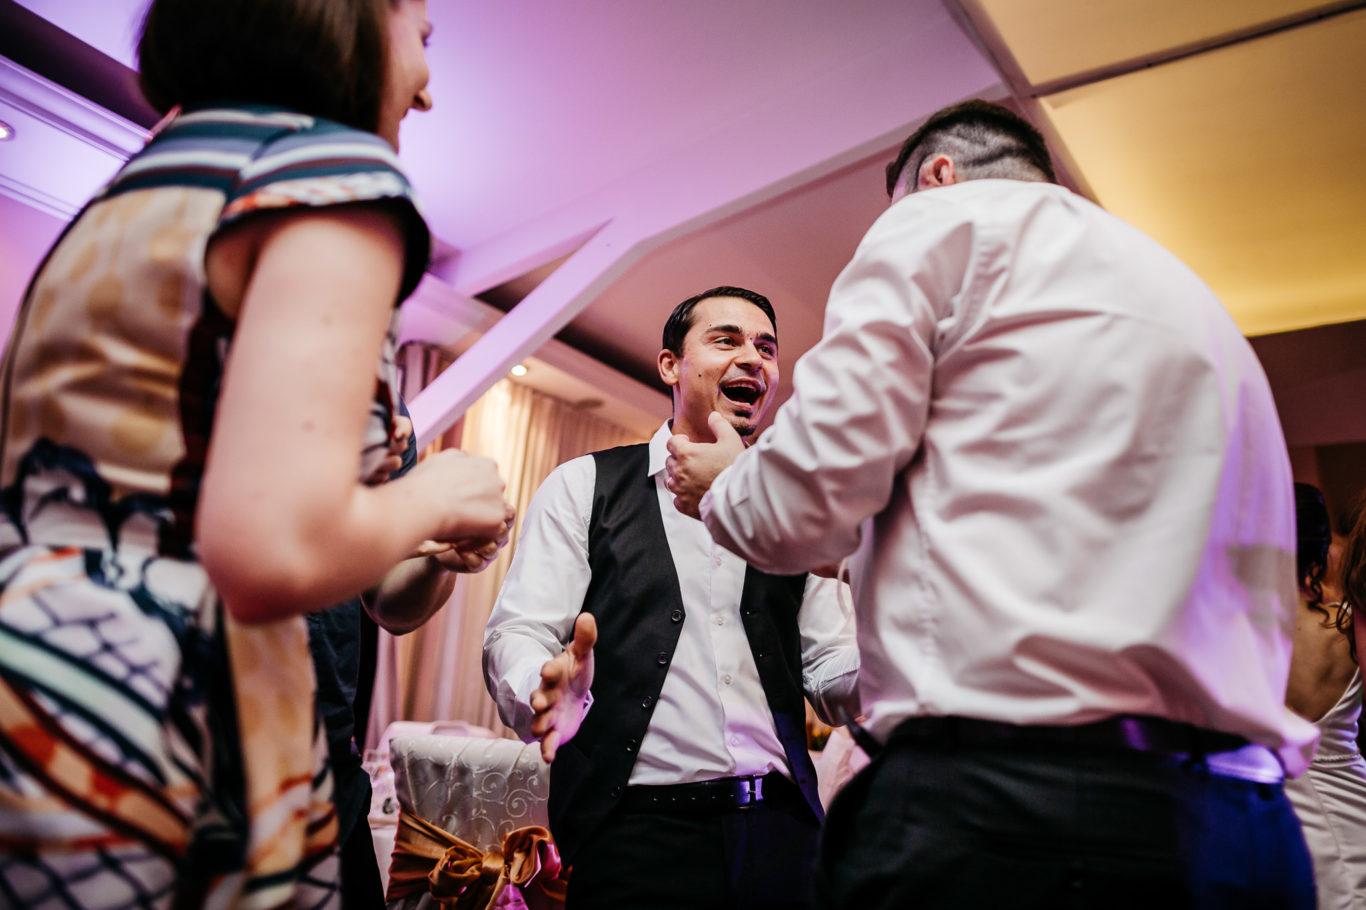 0722-fotografie-nunta-bucuresti-dana-radu-fotograf-ciprian-dumitrescu-dc1_4417